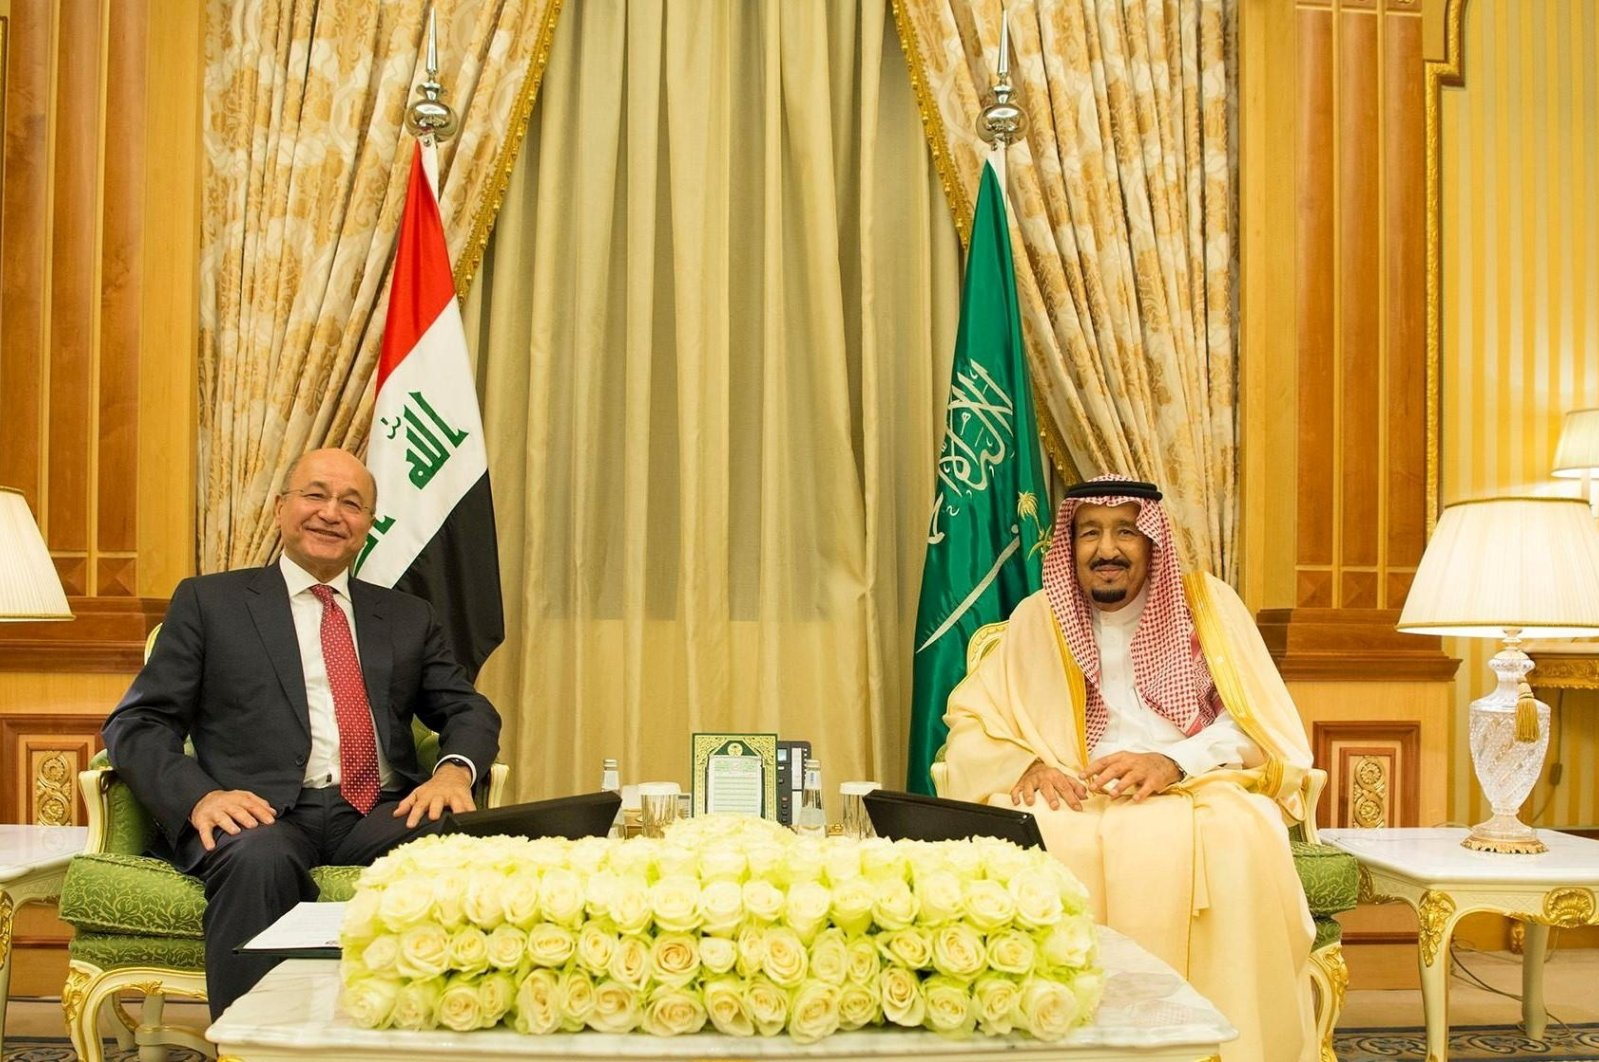 Saudi Arabia's King Salman bin Abdulaziz Al Saud meets with Iraqi Prime Minister Mustafa Al-Kadhimi, in Riyadh, Saudi Arabia, March 31, 2021. (Reuters Photo)